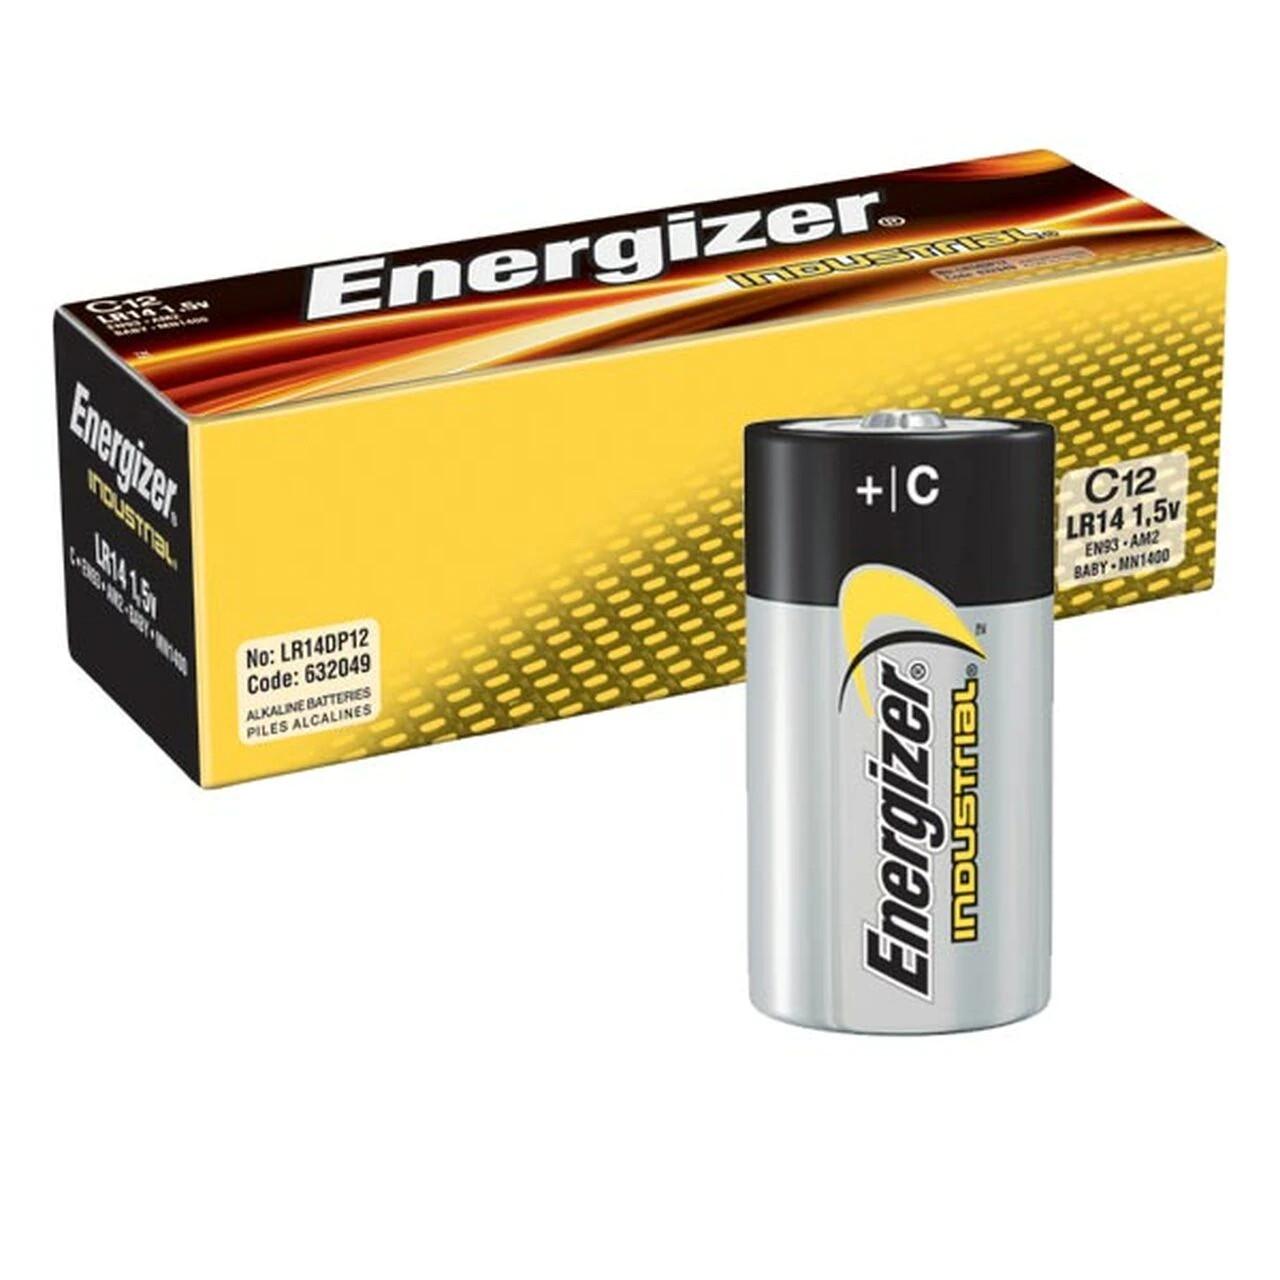 EN93 Energizer Industrial  C Size Batteries